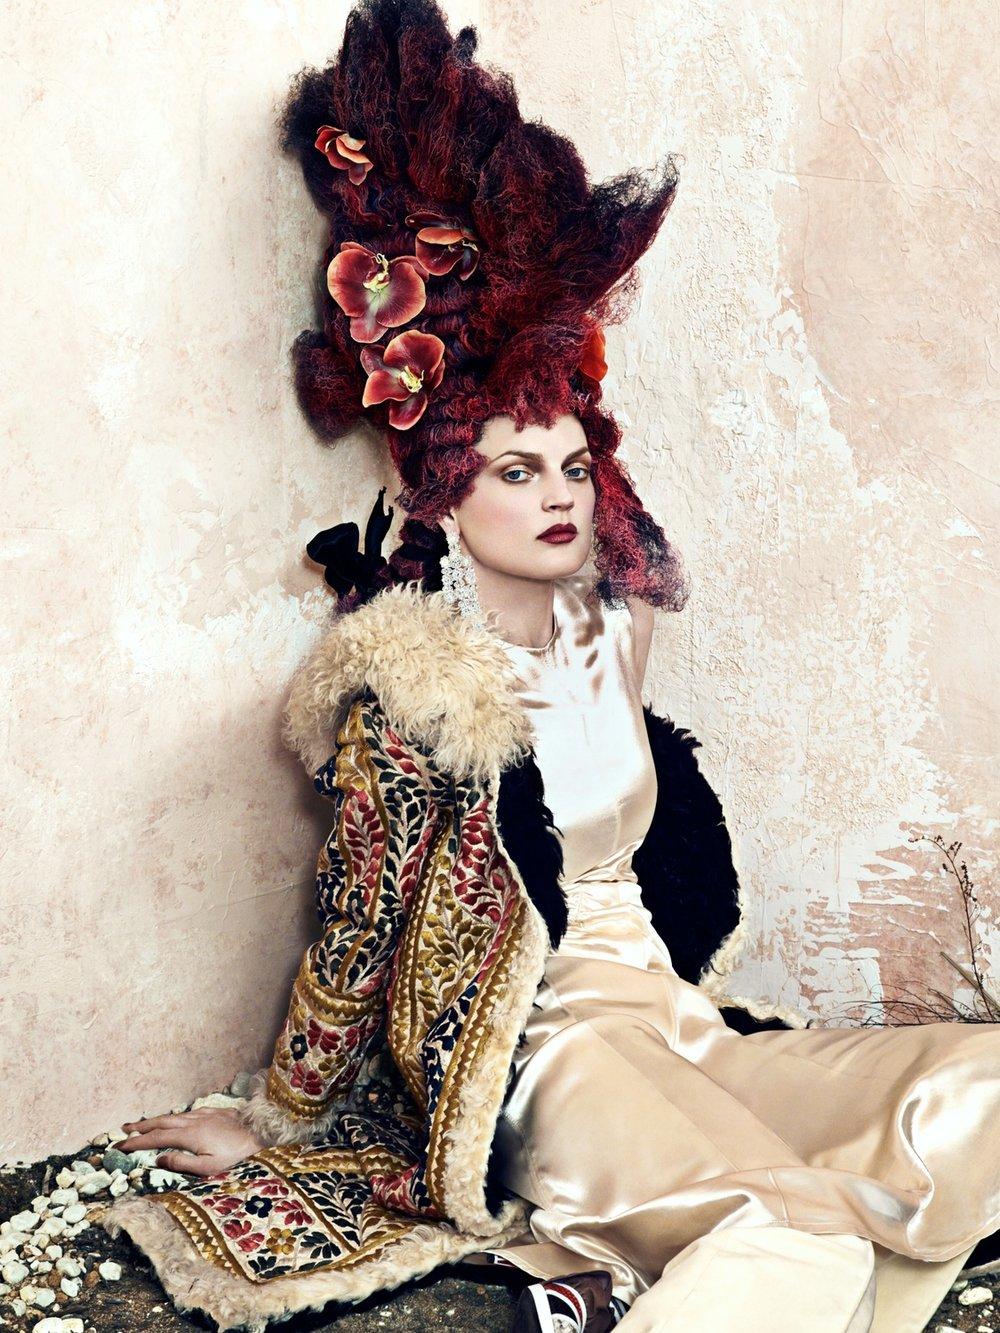 cr-fashion-book-no9-fall-winter-2016-guinevere-van-seenus-by-bjorn-iooss-02.jpg